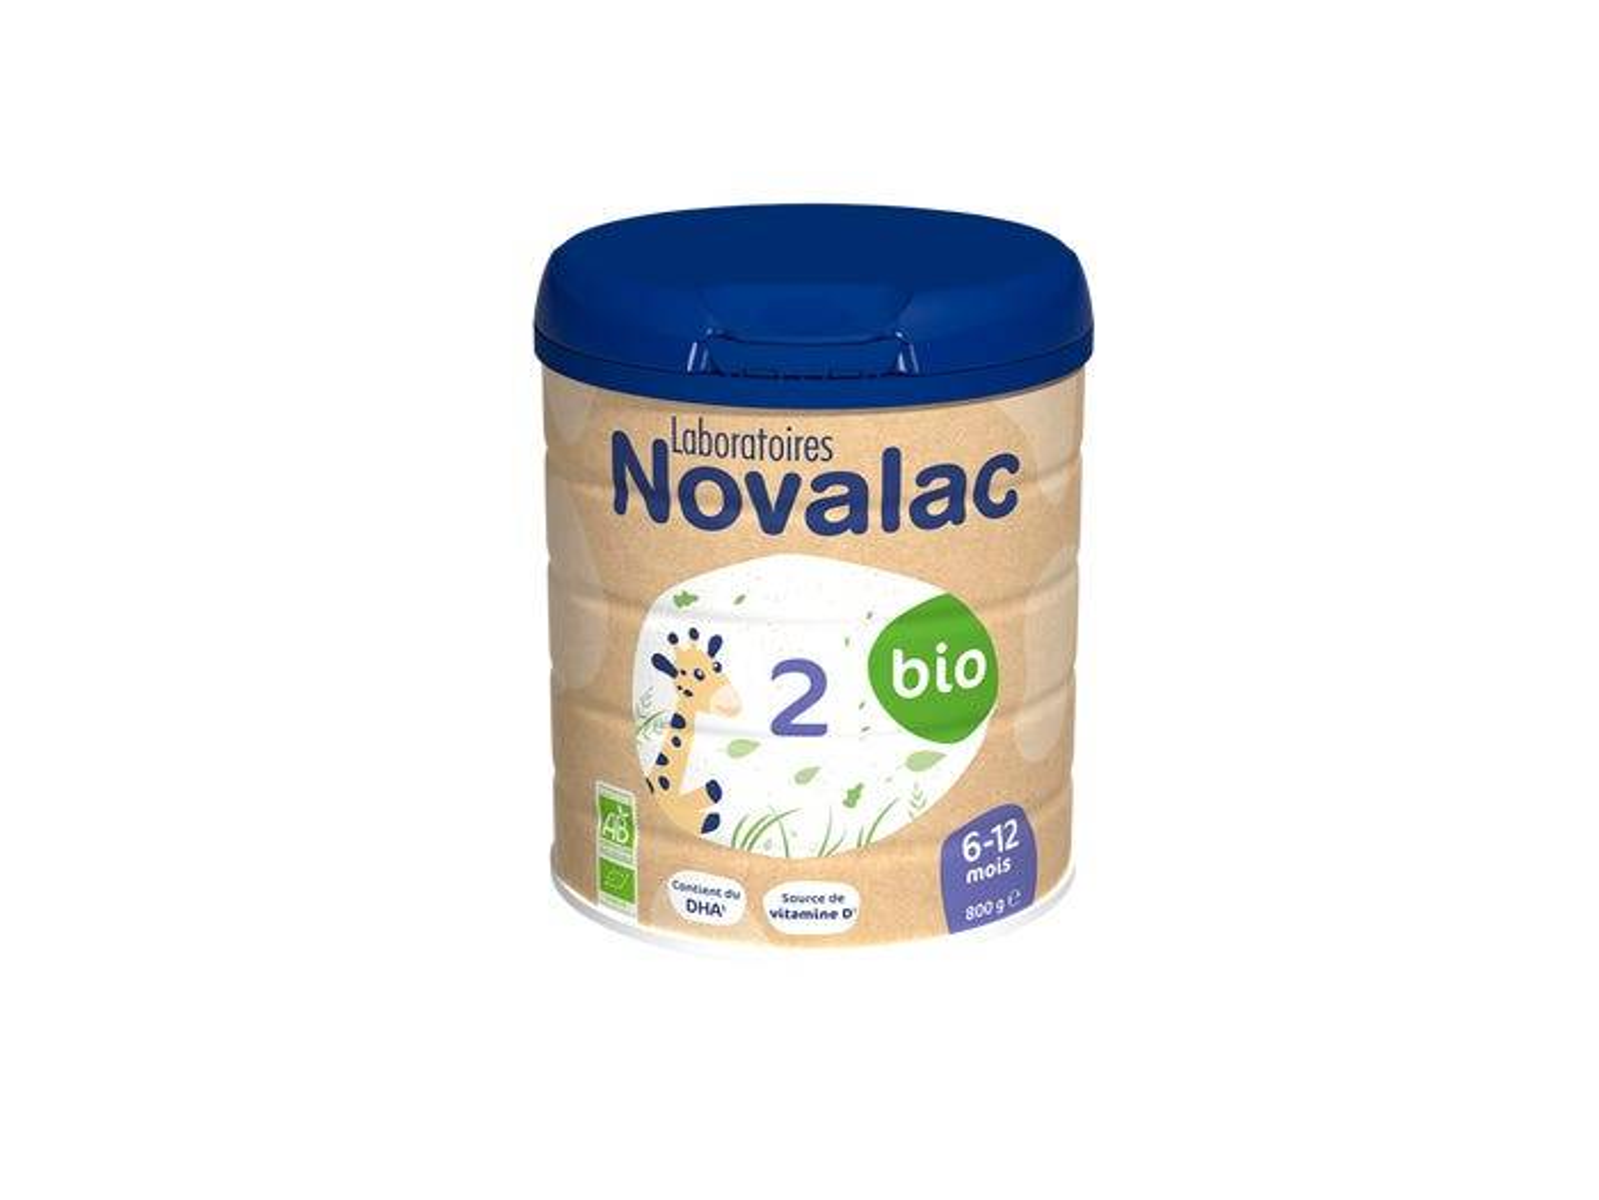 NOVALAC Lait Infantile 2eme Age Bio 6-12 mois, 800g